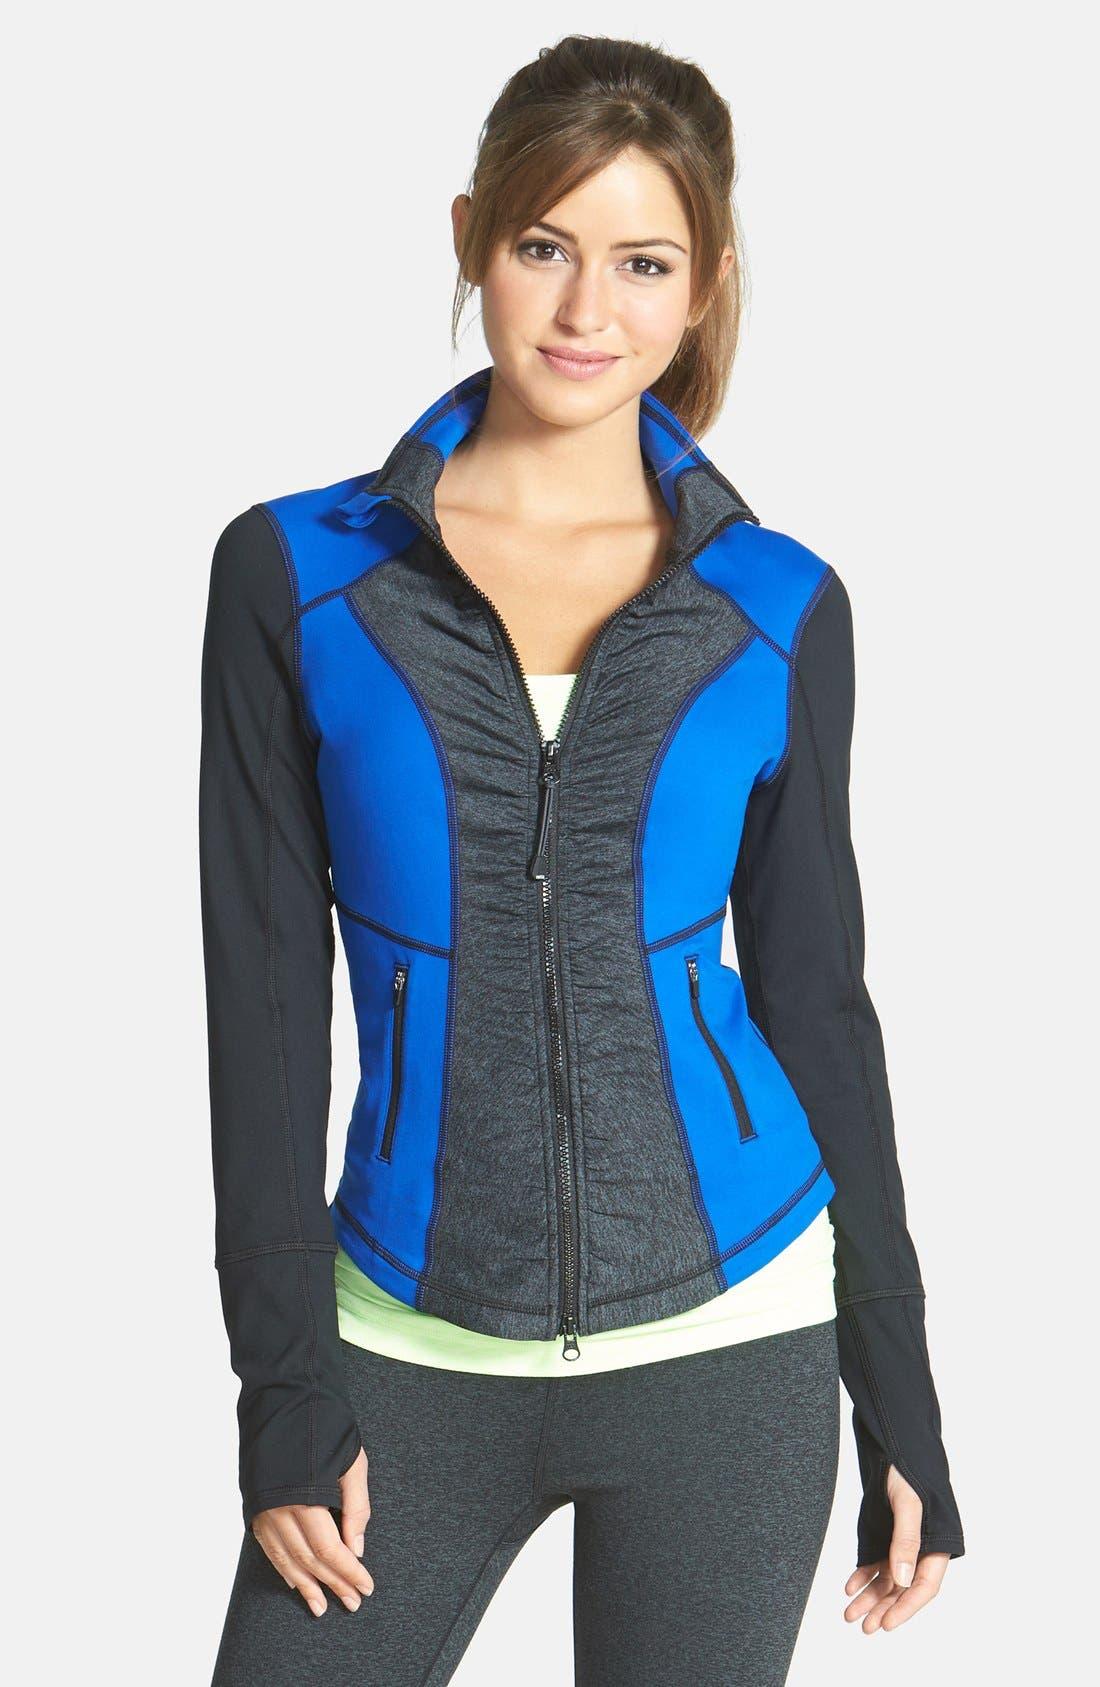 Alternate Image 1 Selected - Zella 'Essential' Jacket